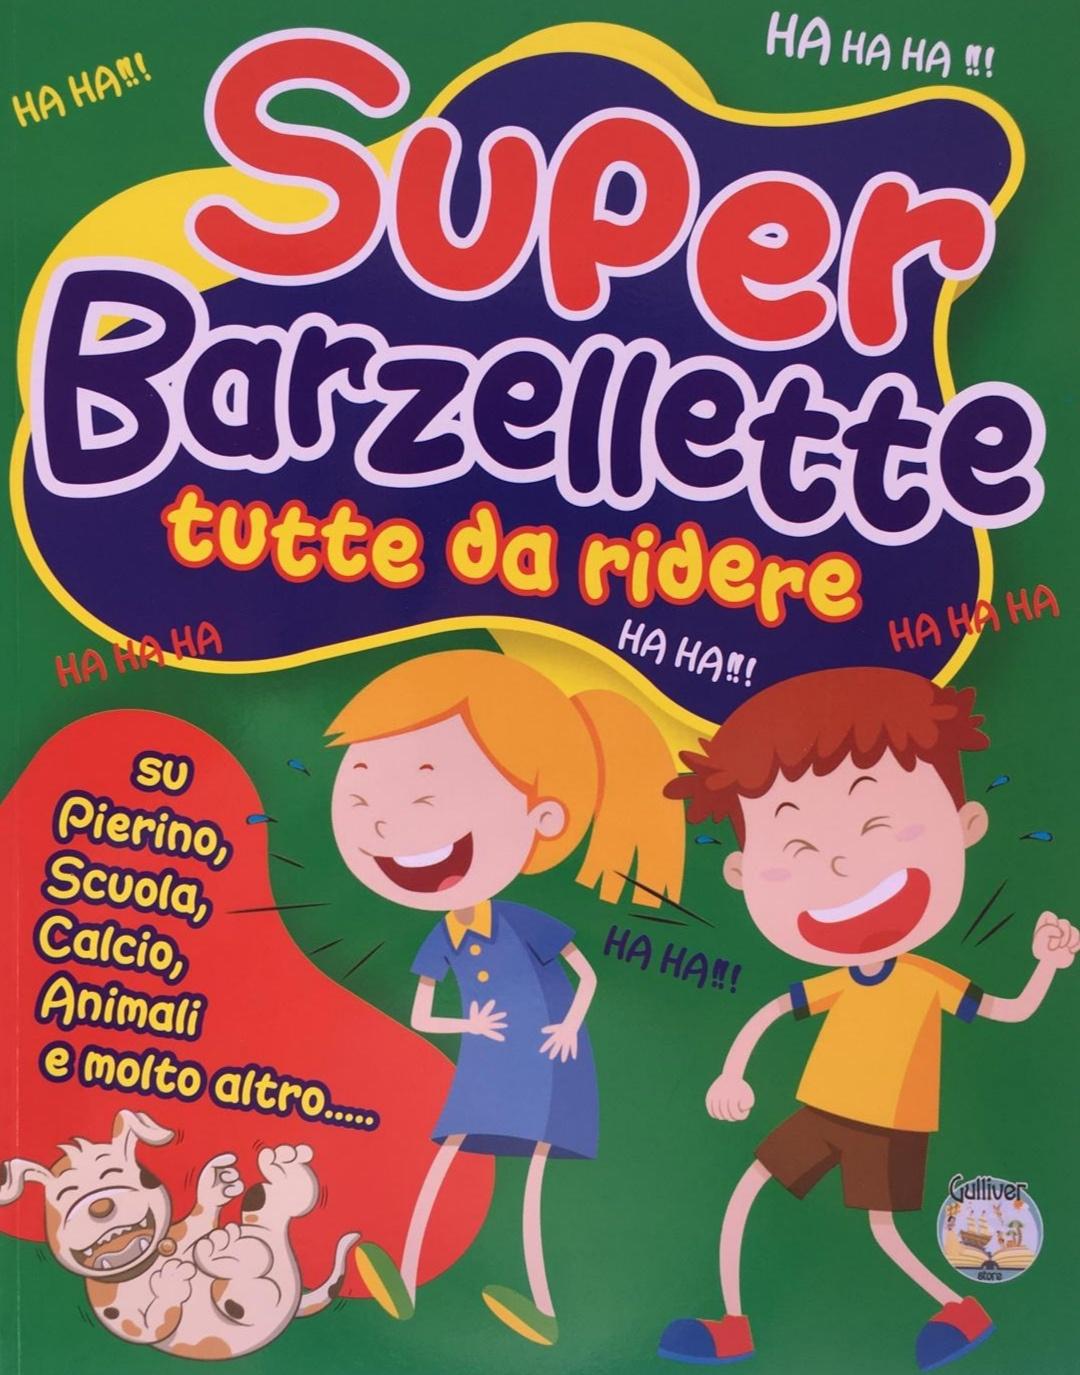 TANTE BARZELLETTE PER BAMBINI